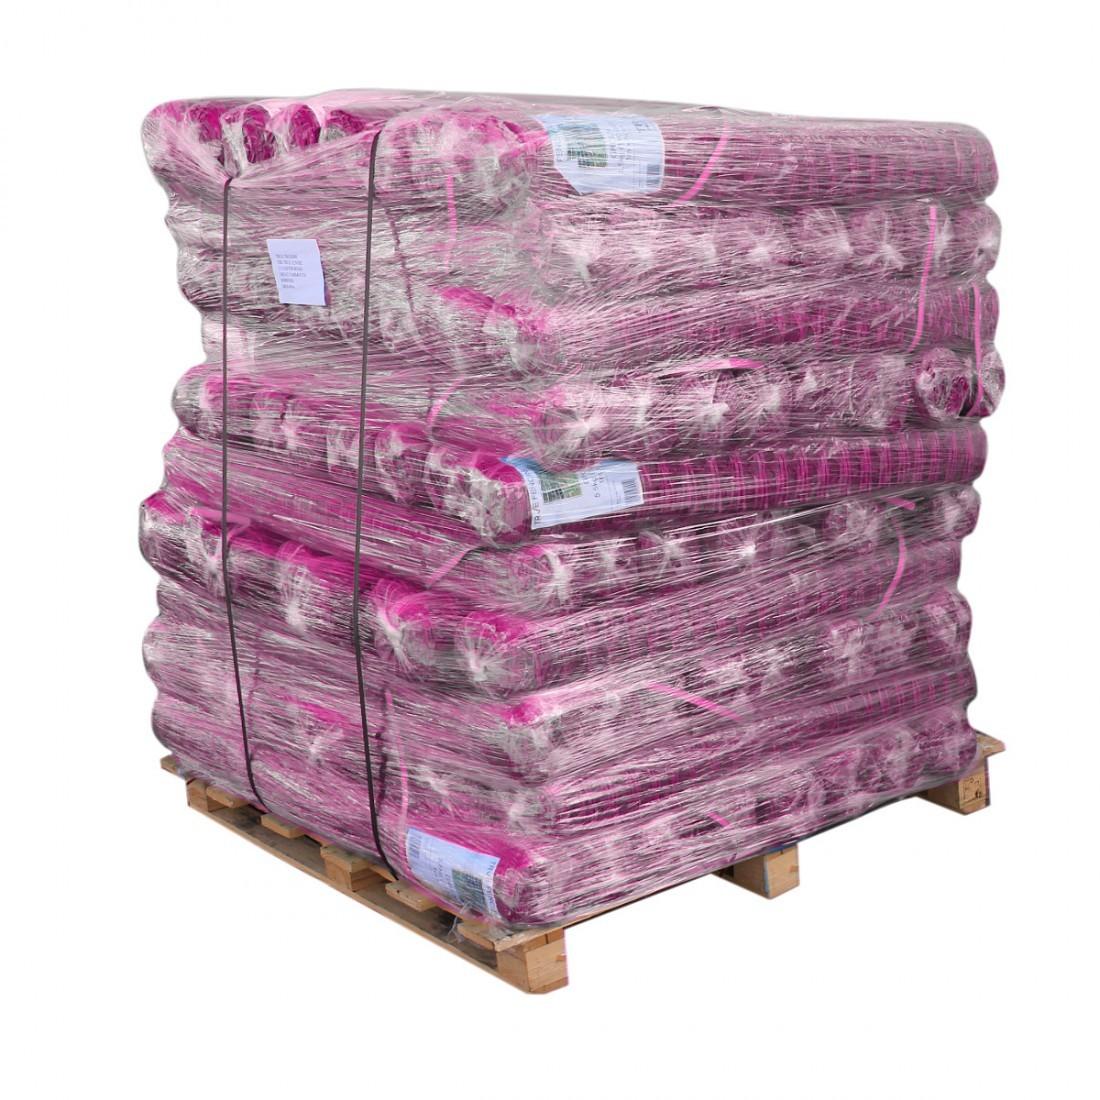 Pink Barrier Fence Plastic Mesh